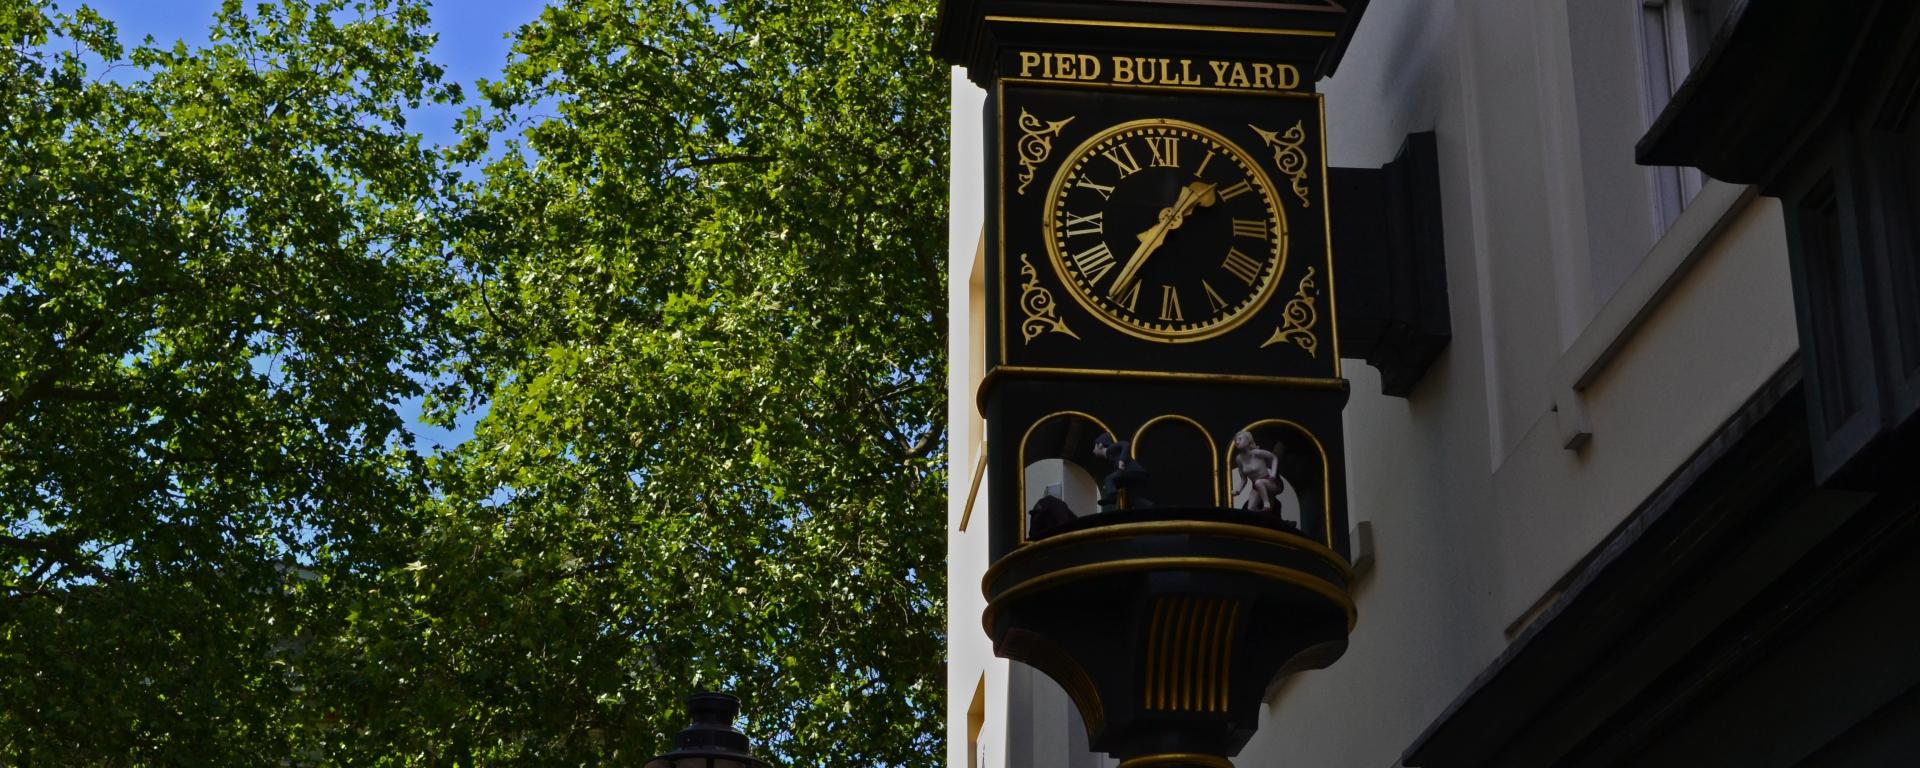 A beautiful wall clock outside Pied Bull Yard, Bloomsbury